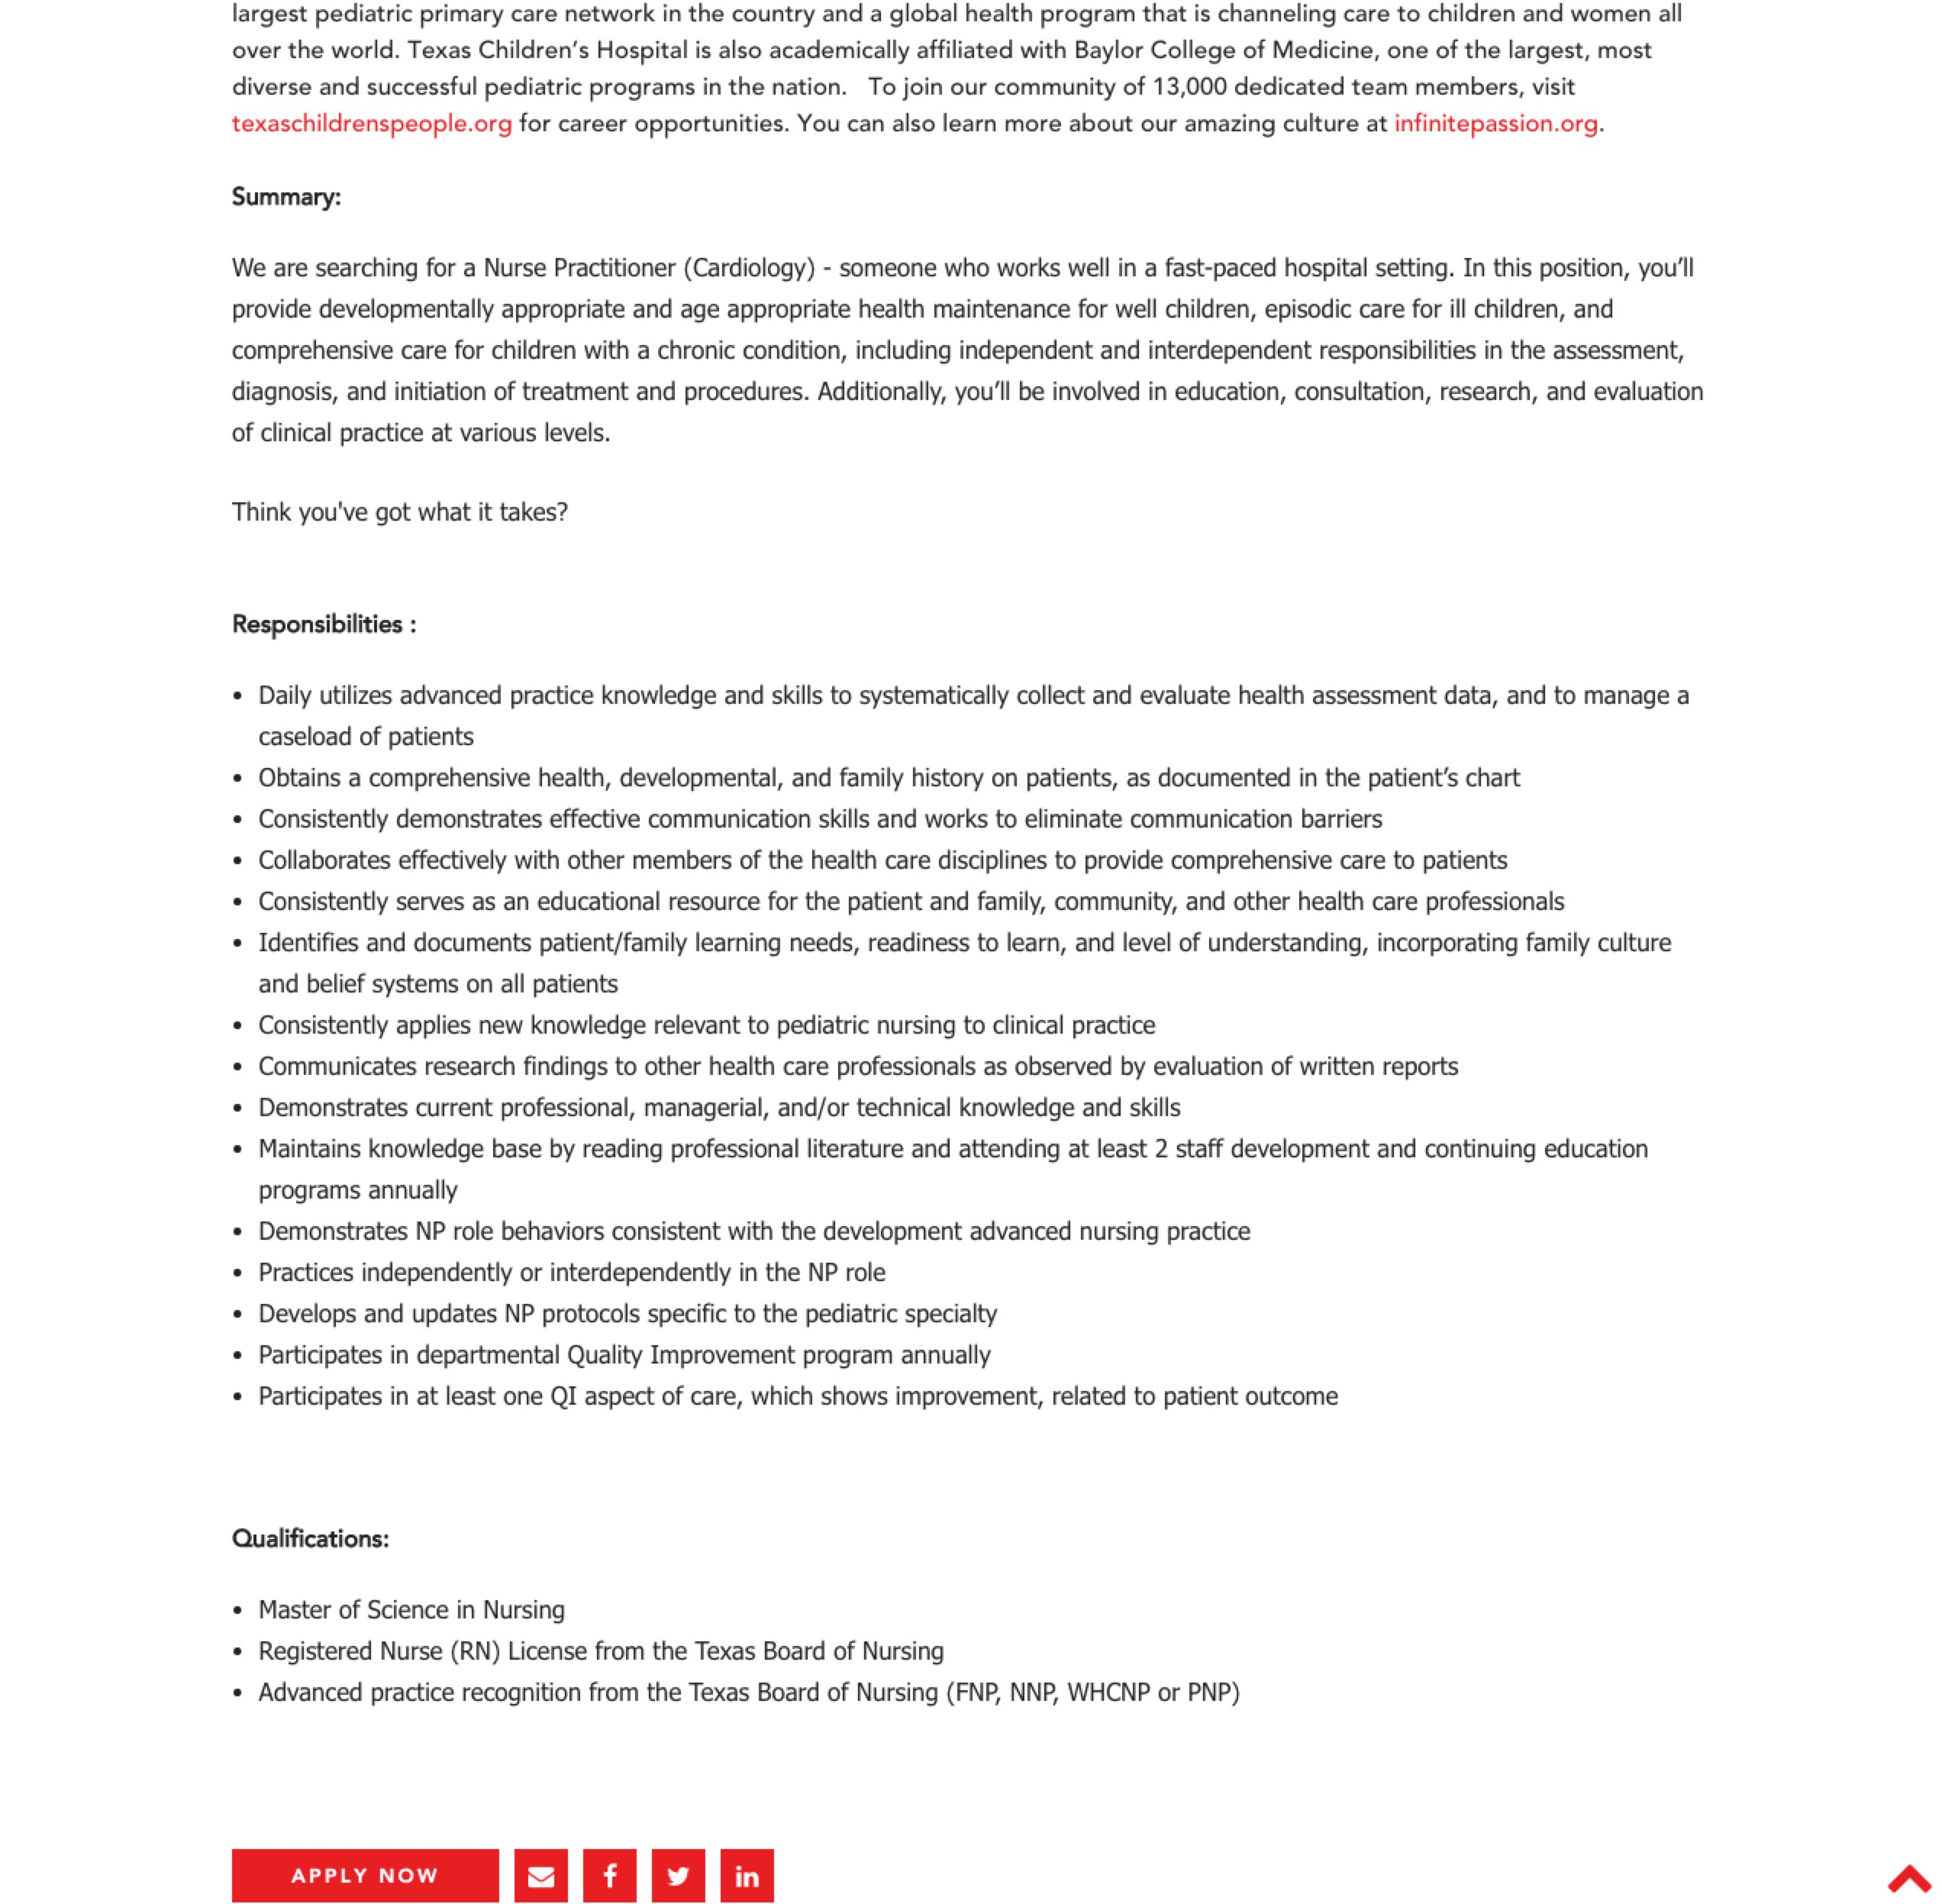 job description template word